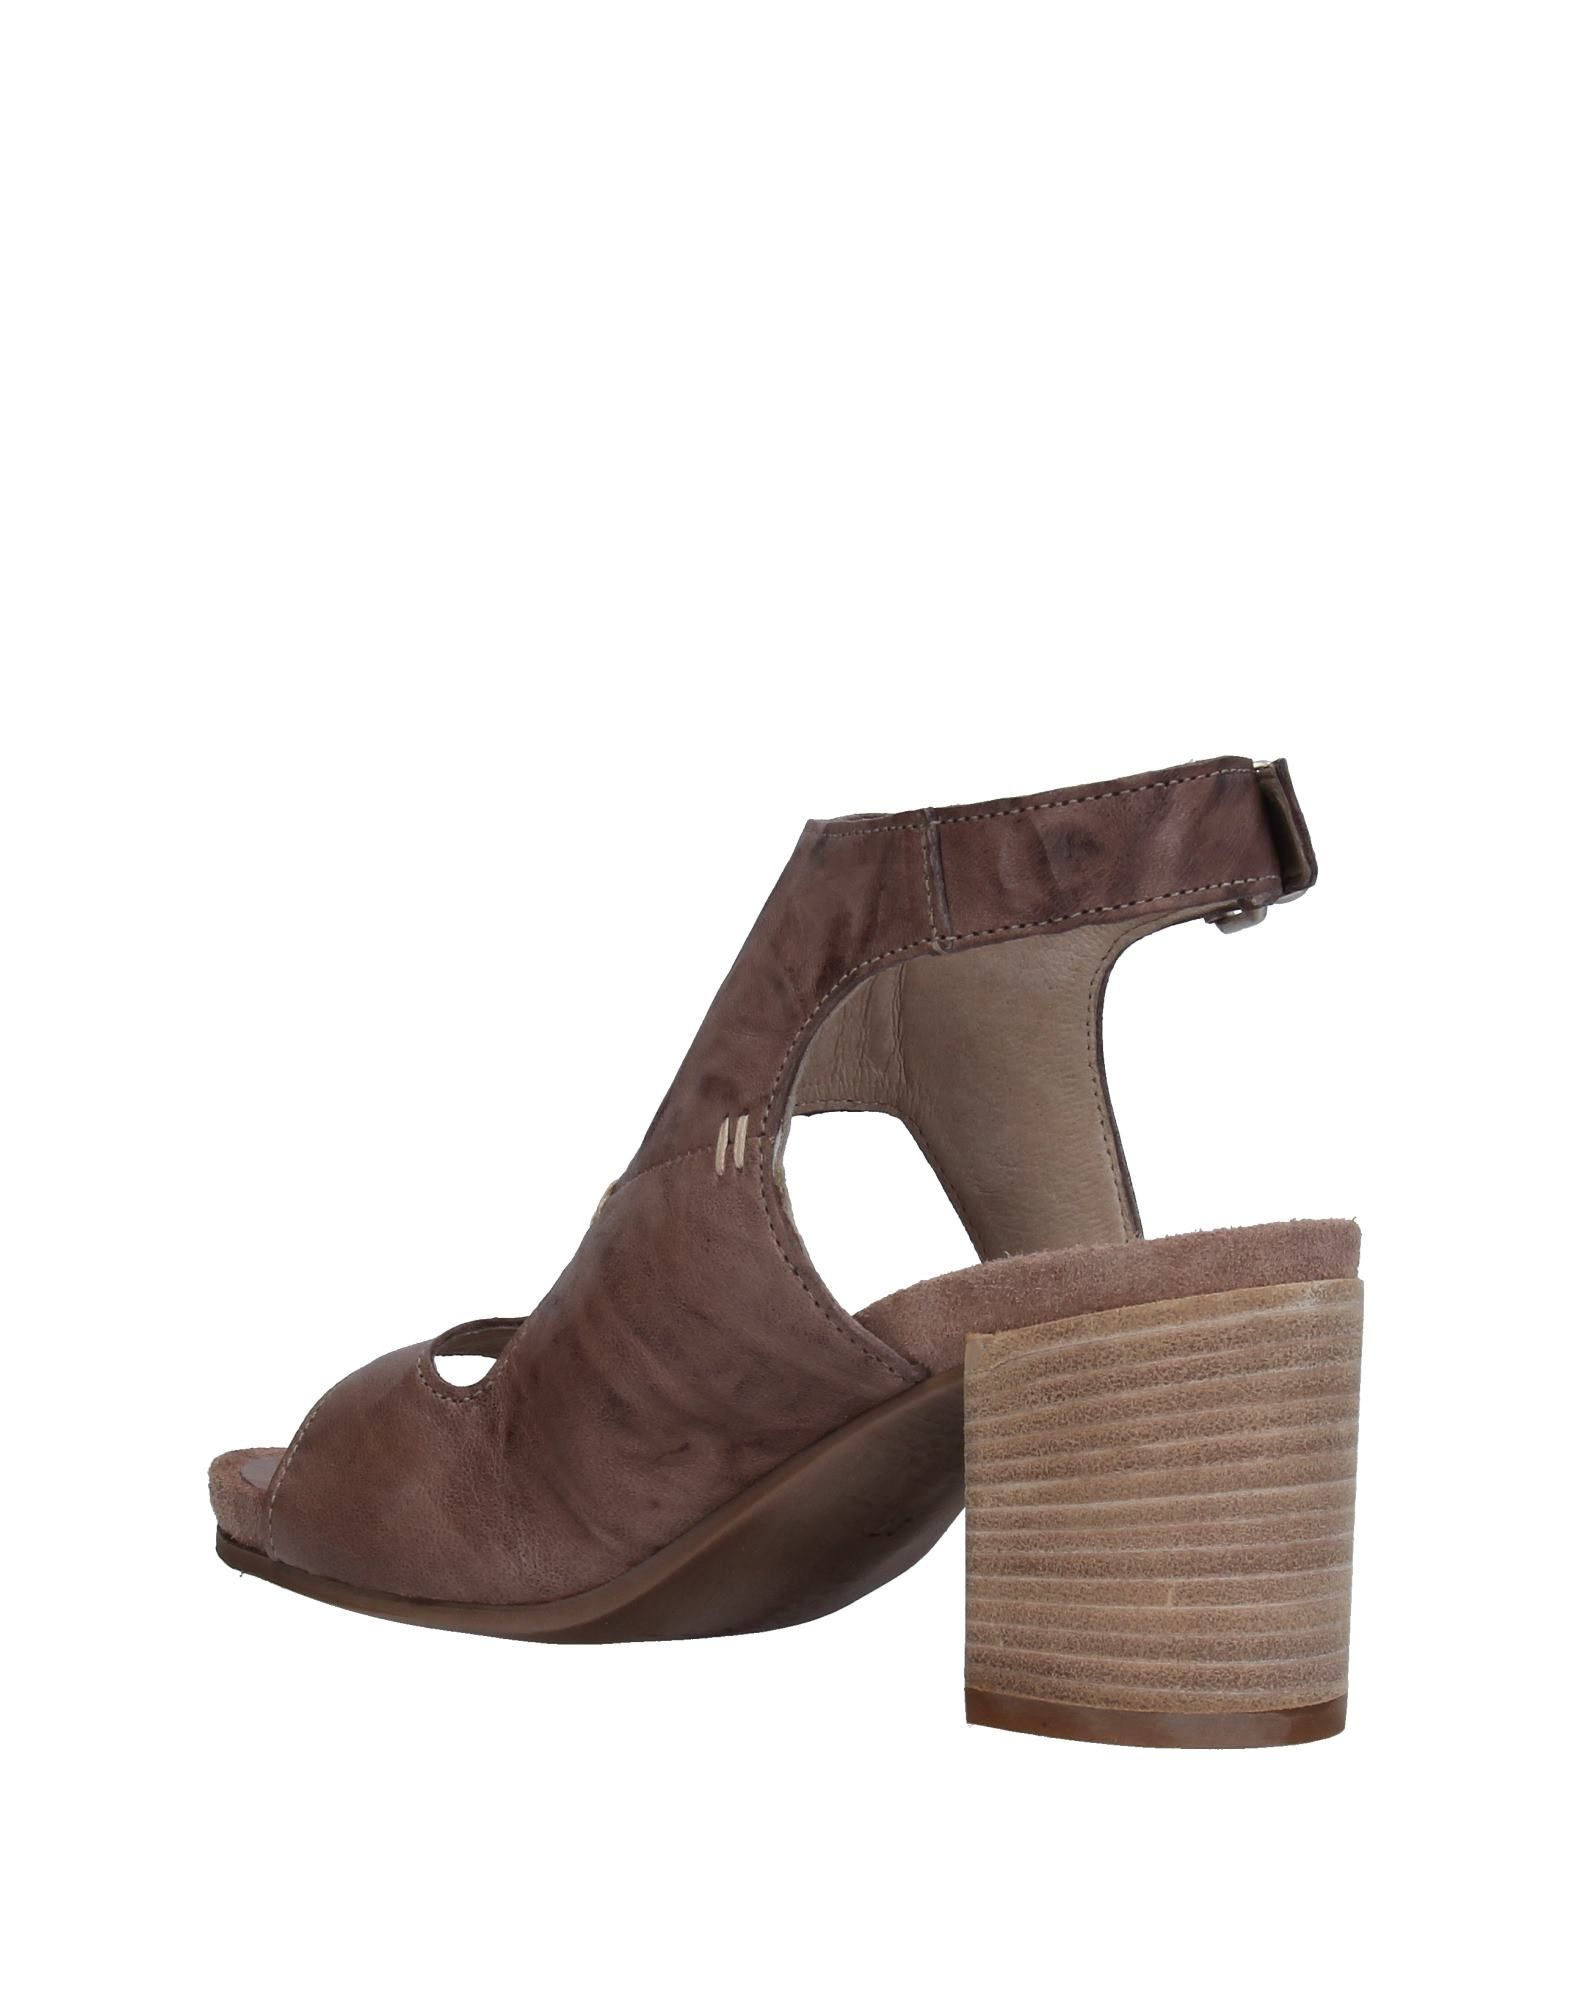 Khrio' Sandalen Qualität Damen  11326996TF Gute Qualität Sandalen beliebte Schuhe df5a91